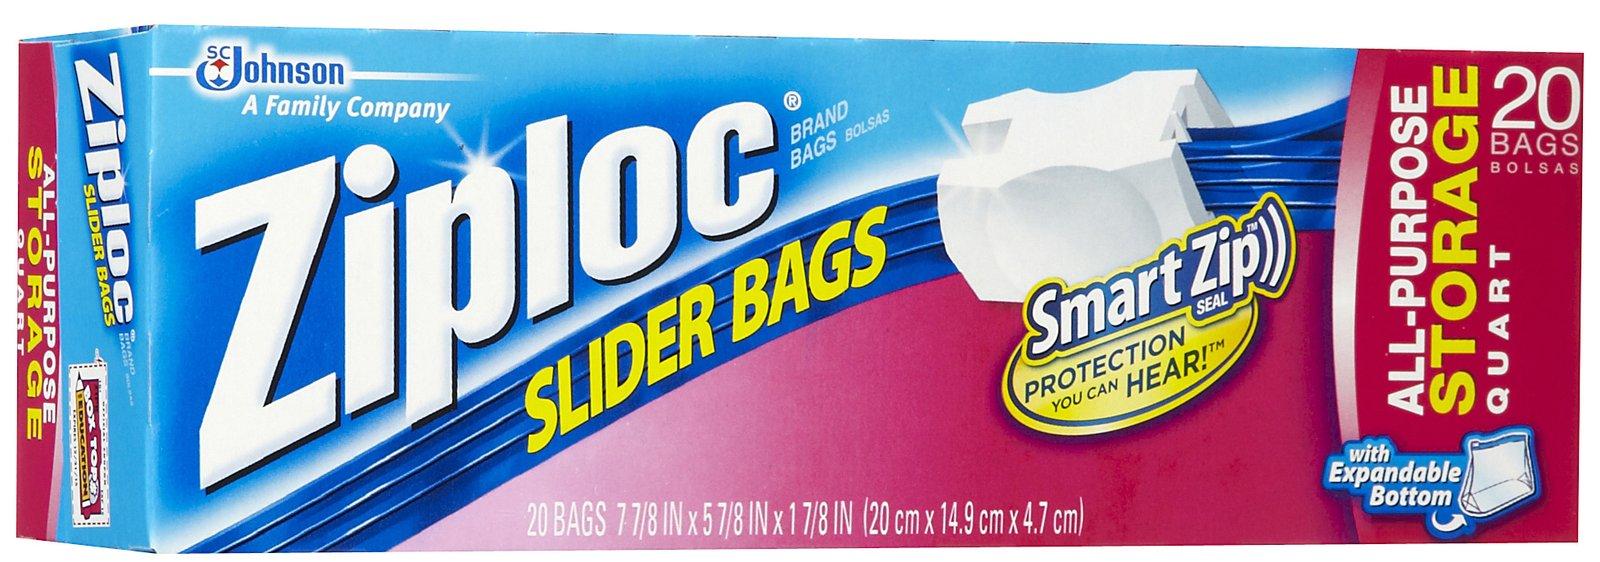 Walgreens: Ziploc Storage Bags only $0.25!